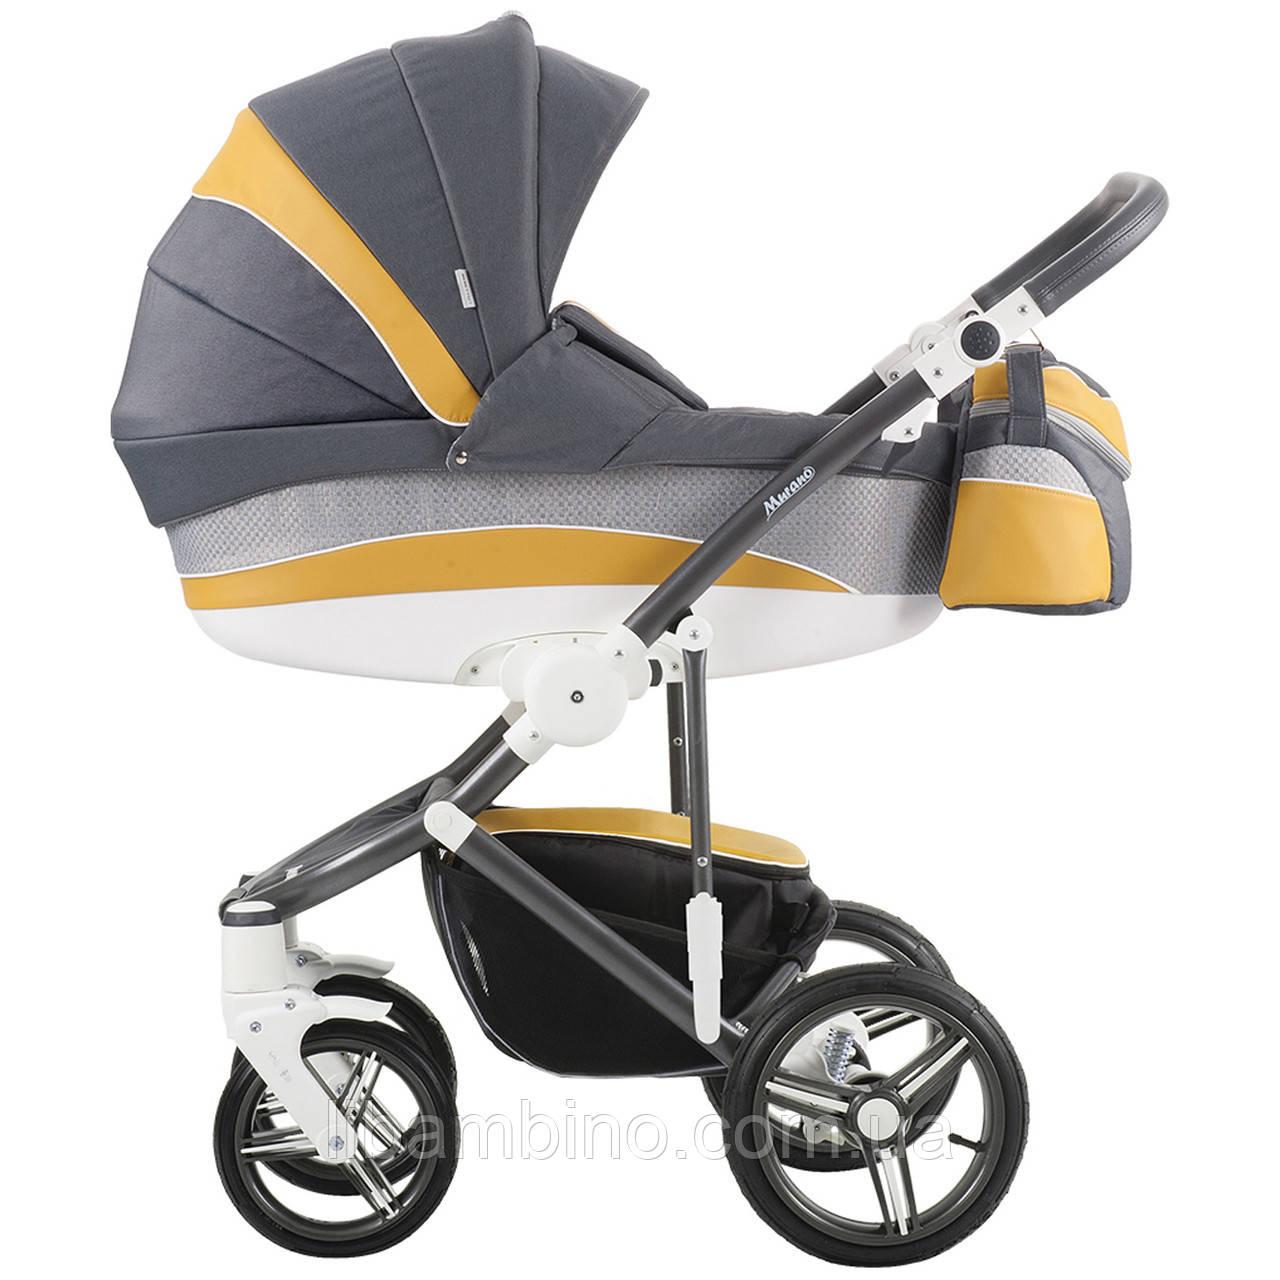 Дитяча універсальна коляска 2 в 1 Bebetto Murano 12M